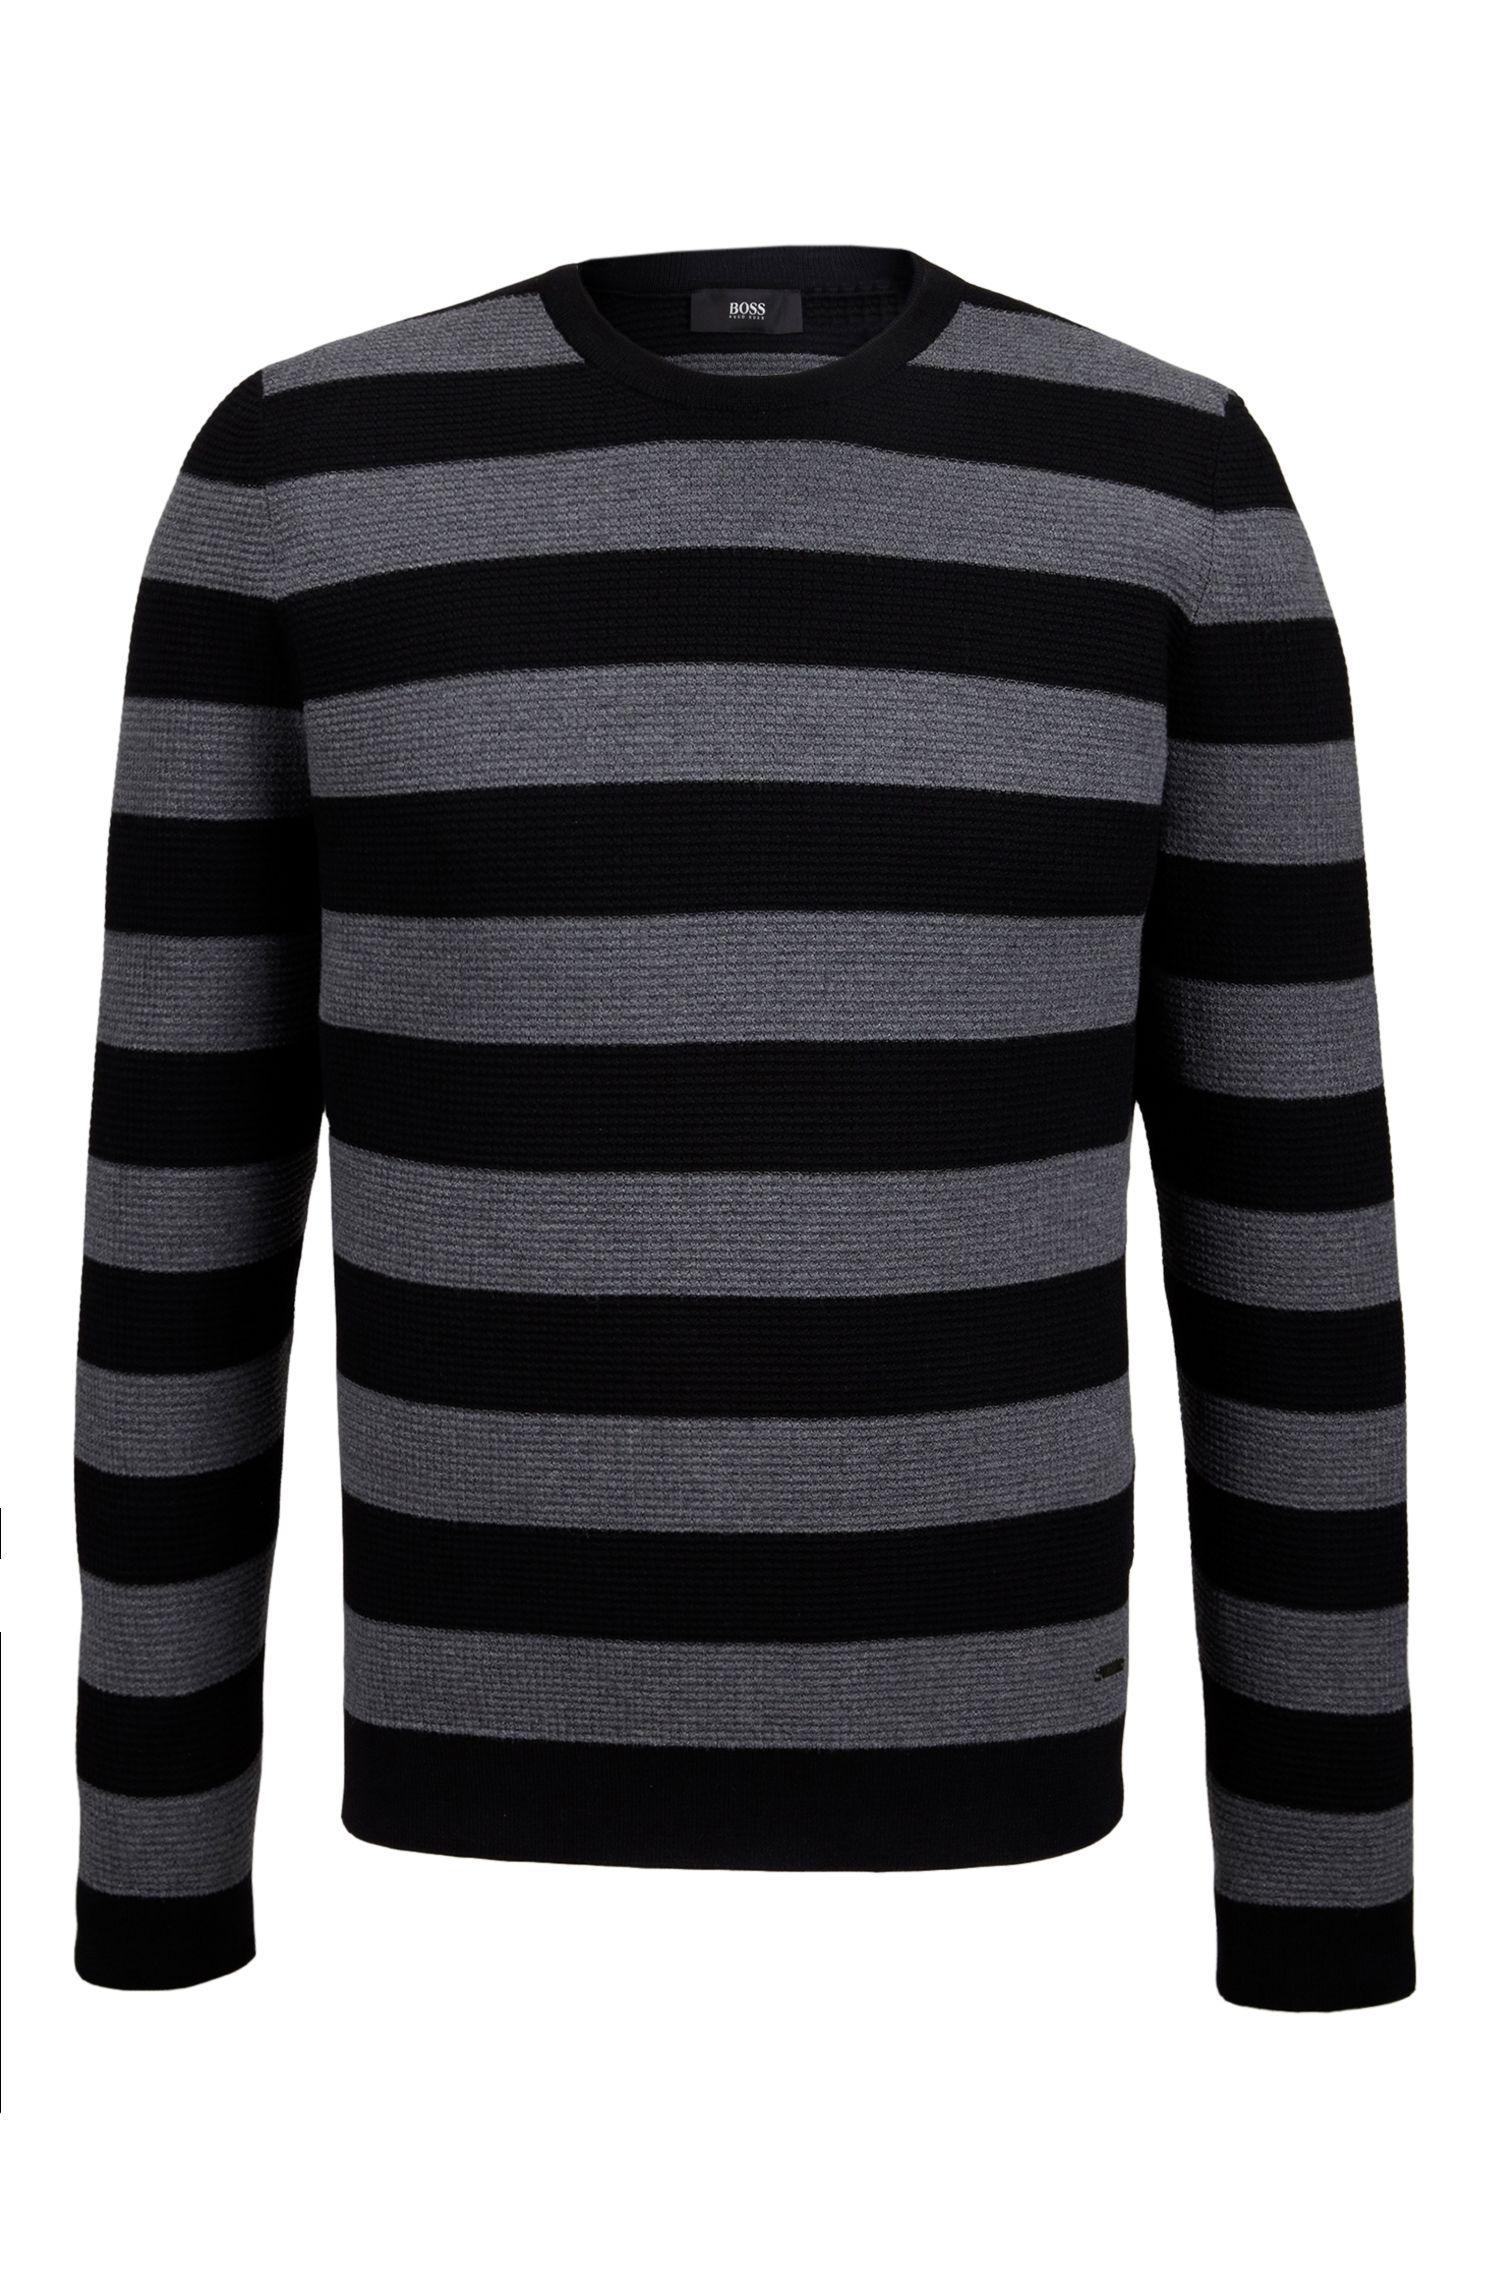 Striped Virgin Wool Sweater | Nantoni